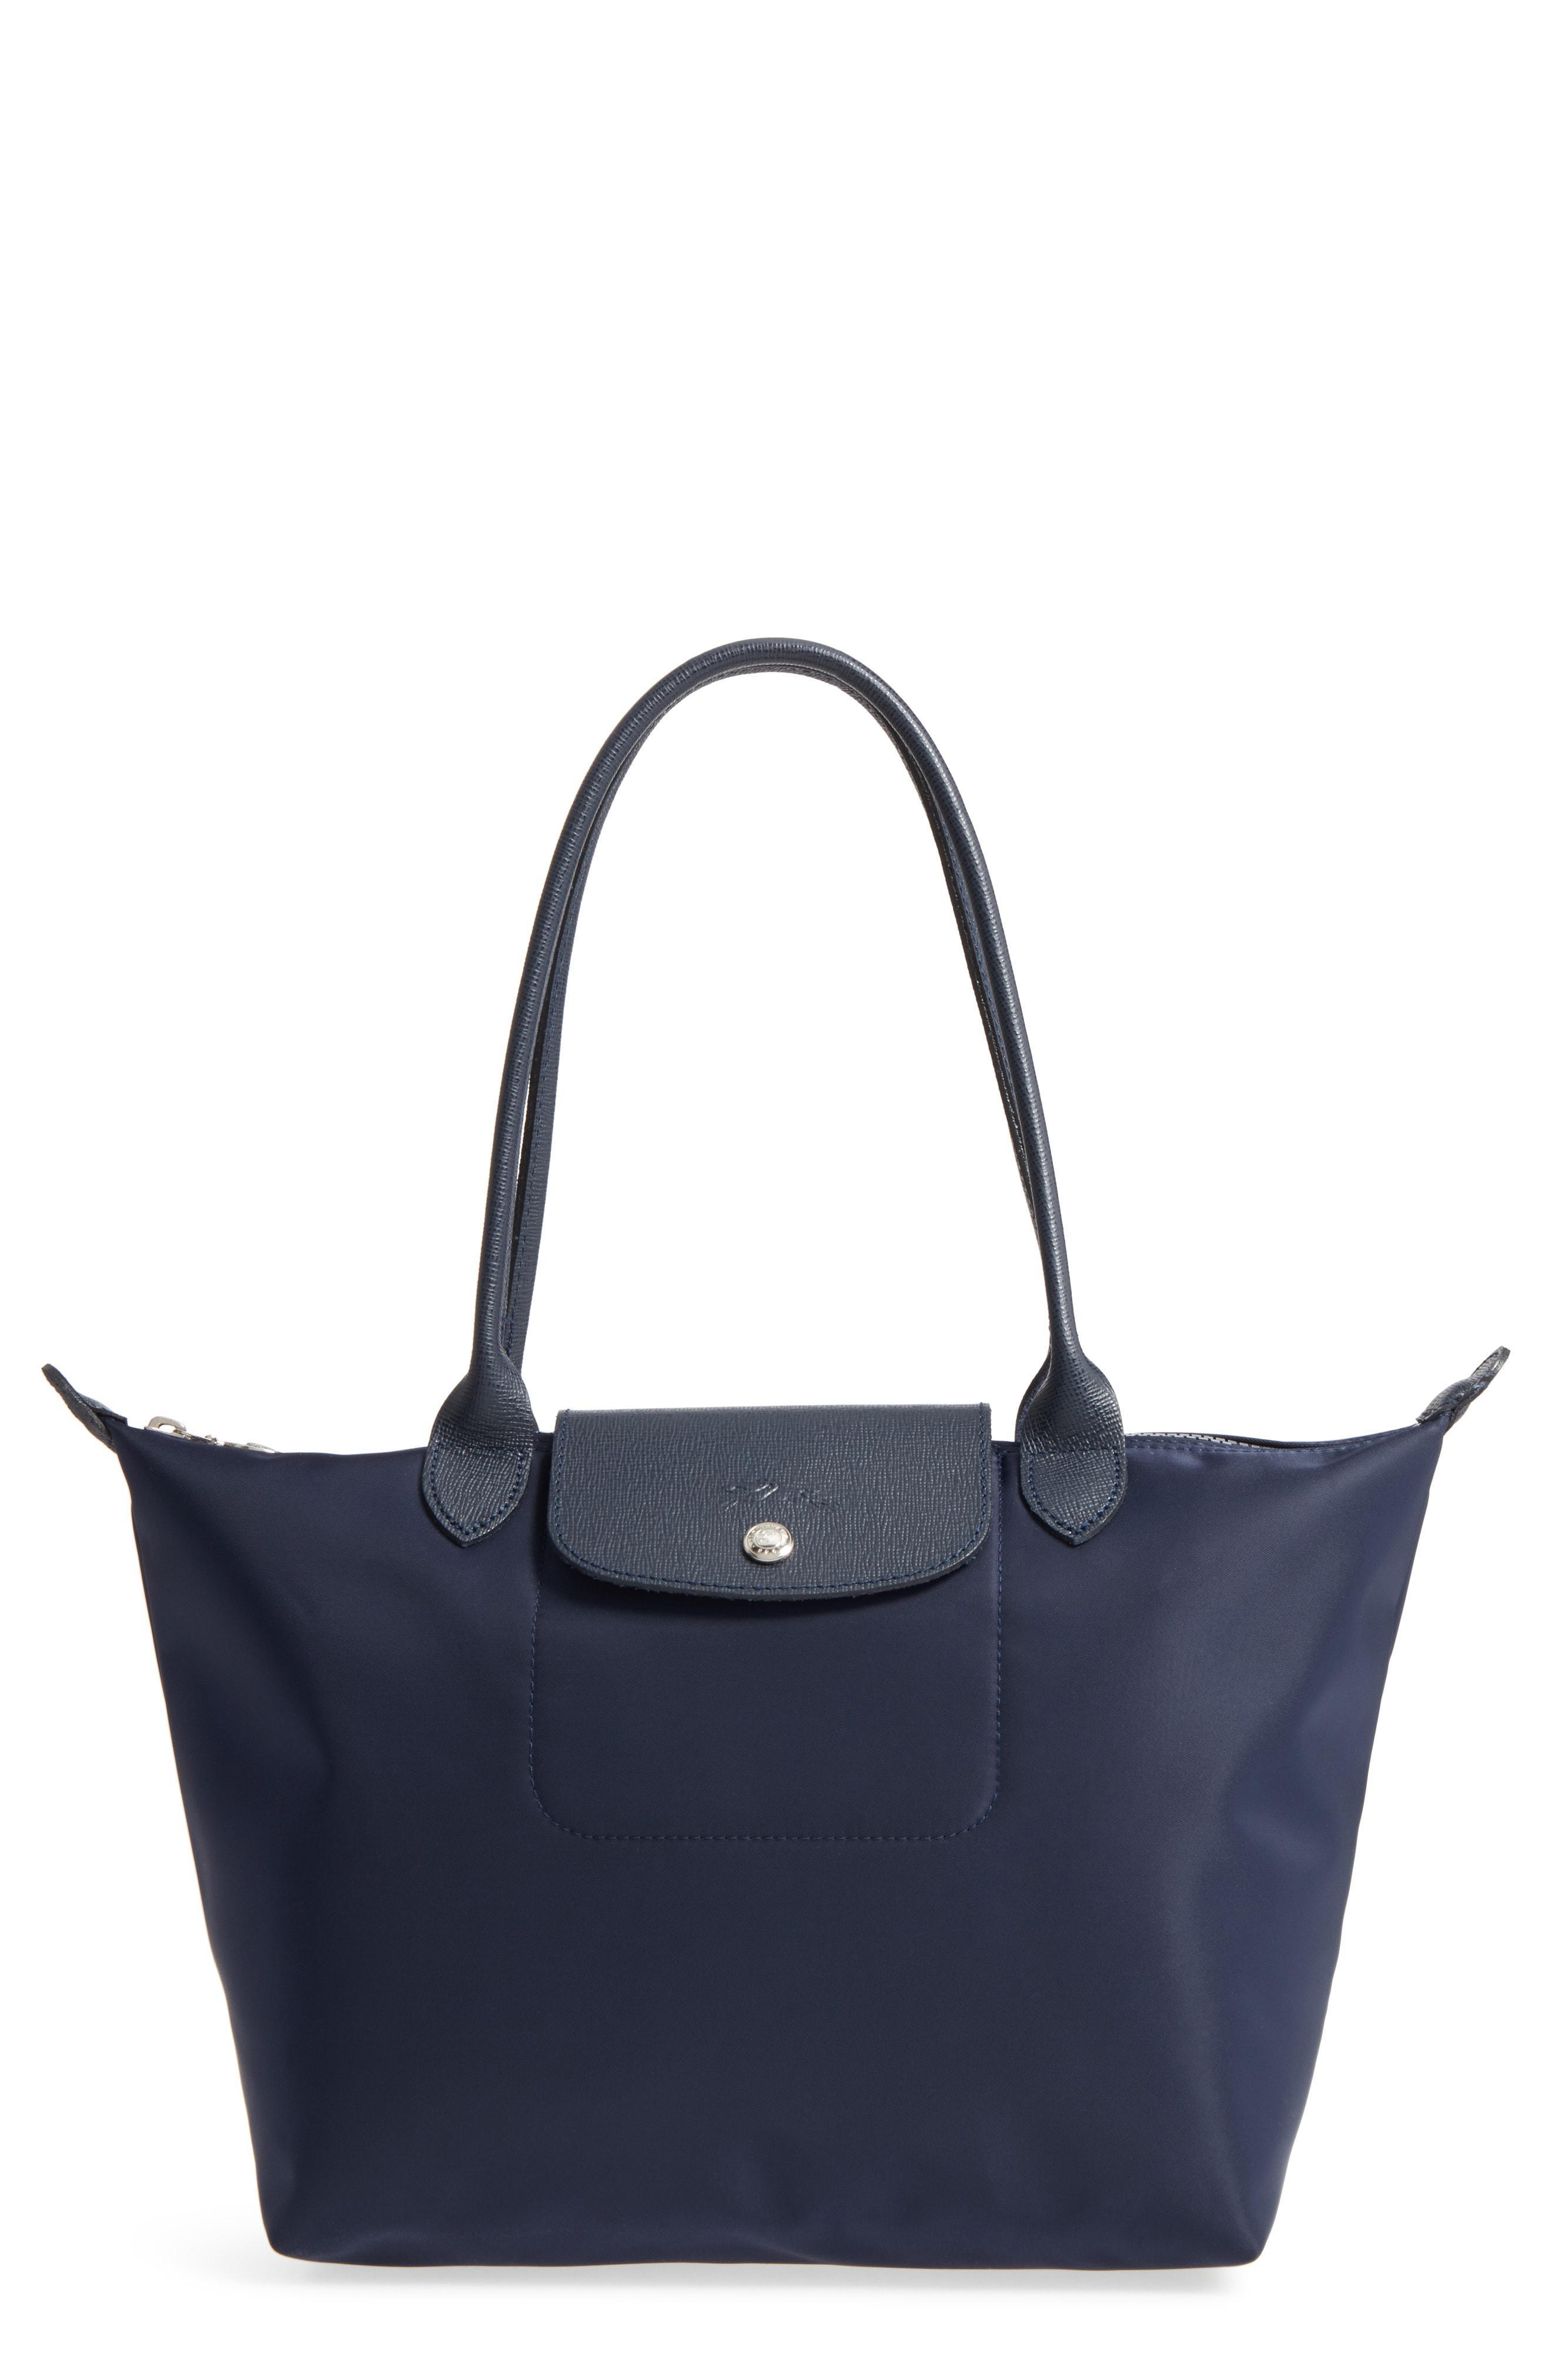 213b1a0912065 Longchamp Small Le Pliage Neo Nylon Tote - - Save 40% - Lyst